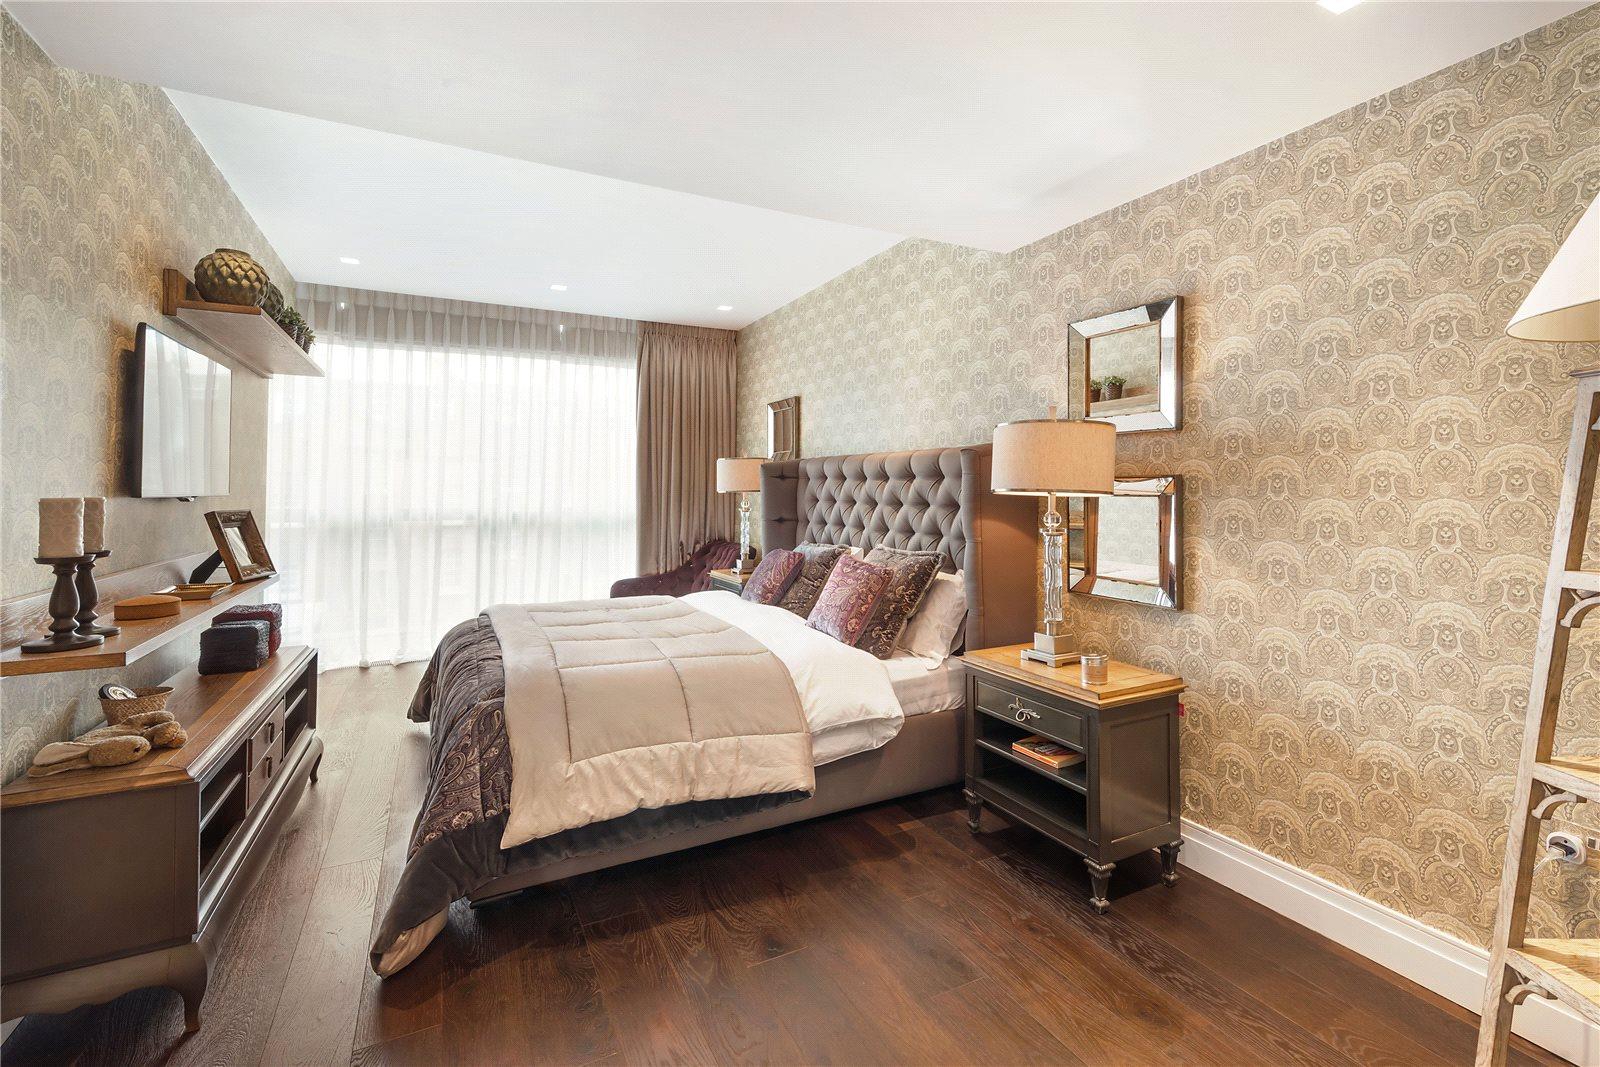 The Knightsbridge, Knightsbridge, London, SW7: a luxury ...